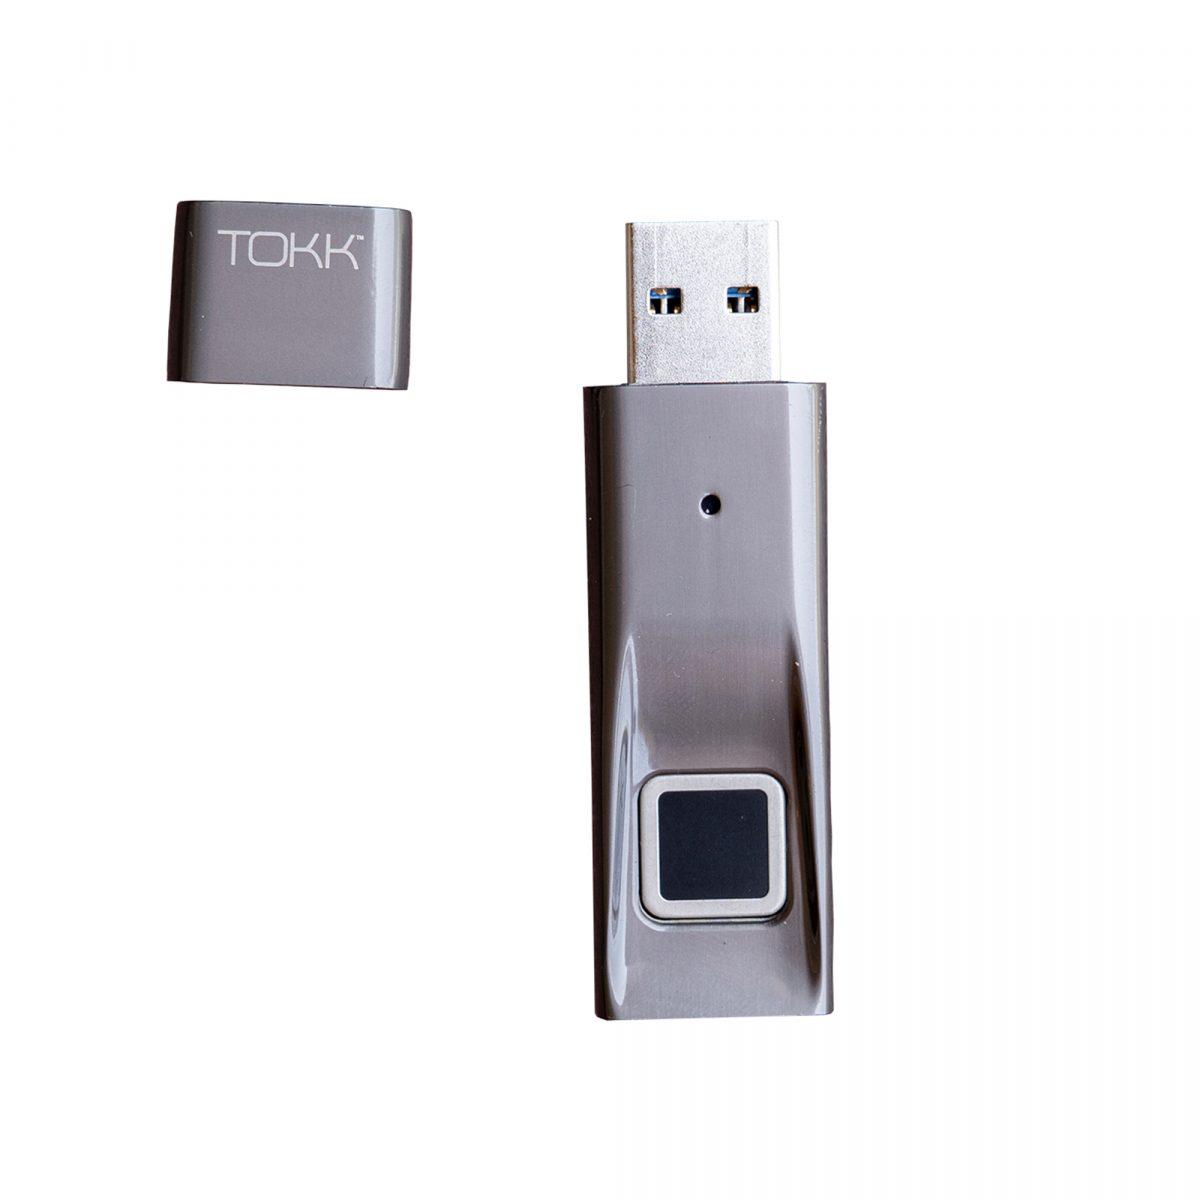 TOKK-USB-Figerprint-open--1200x1200.jpg